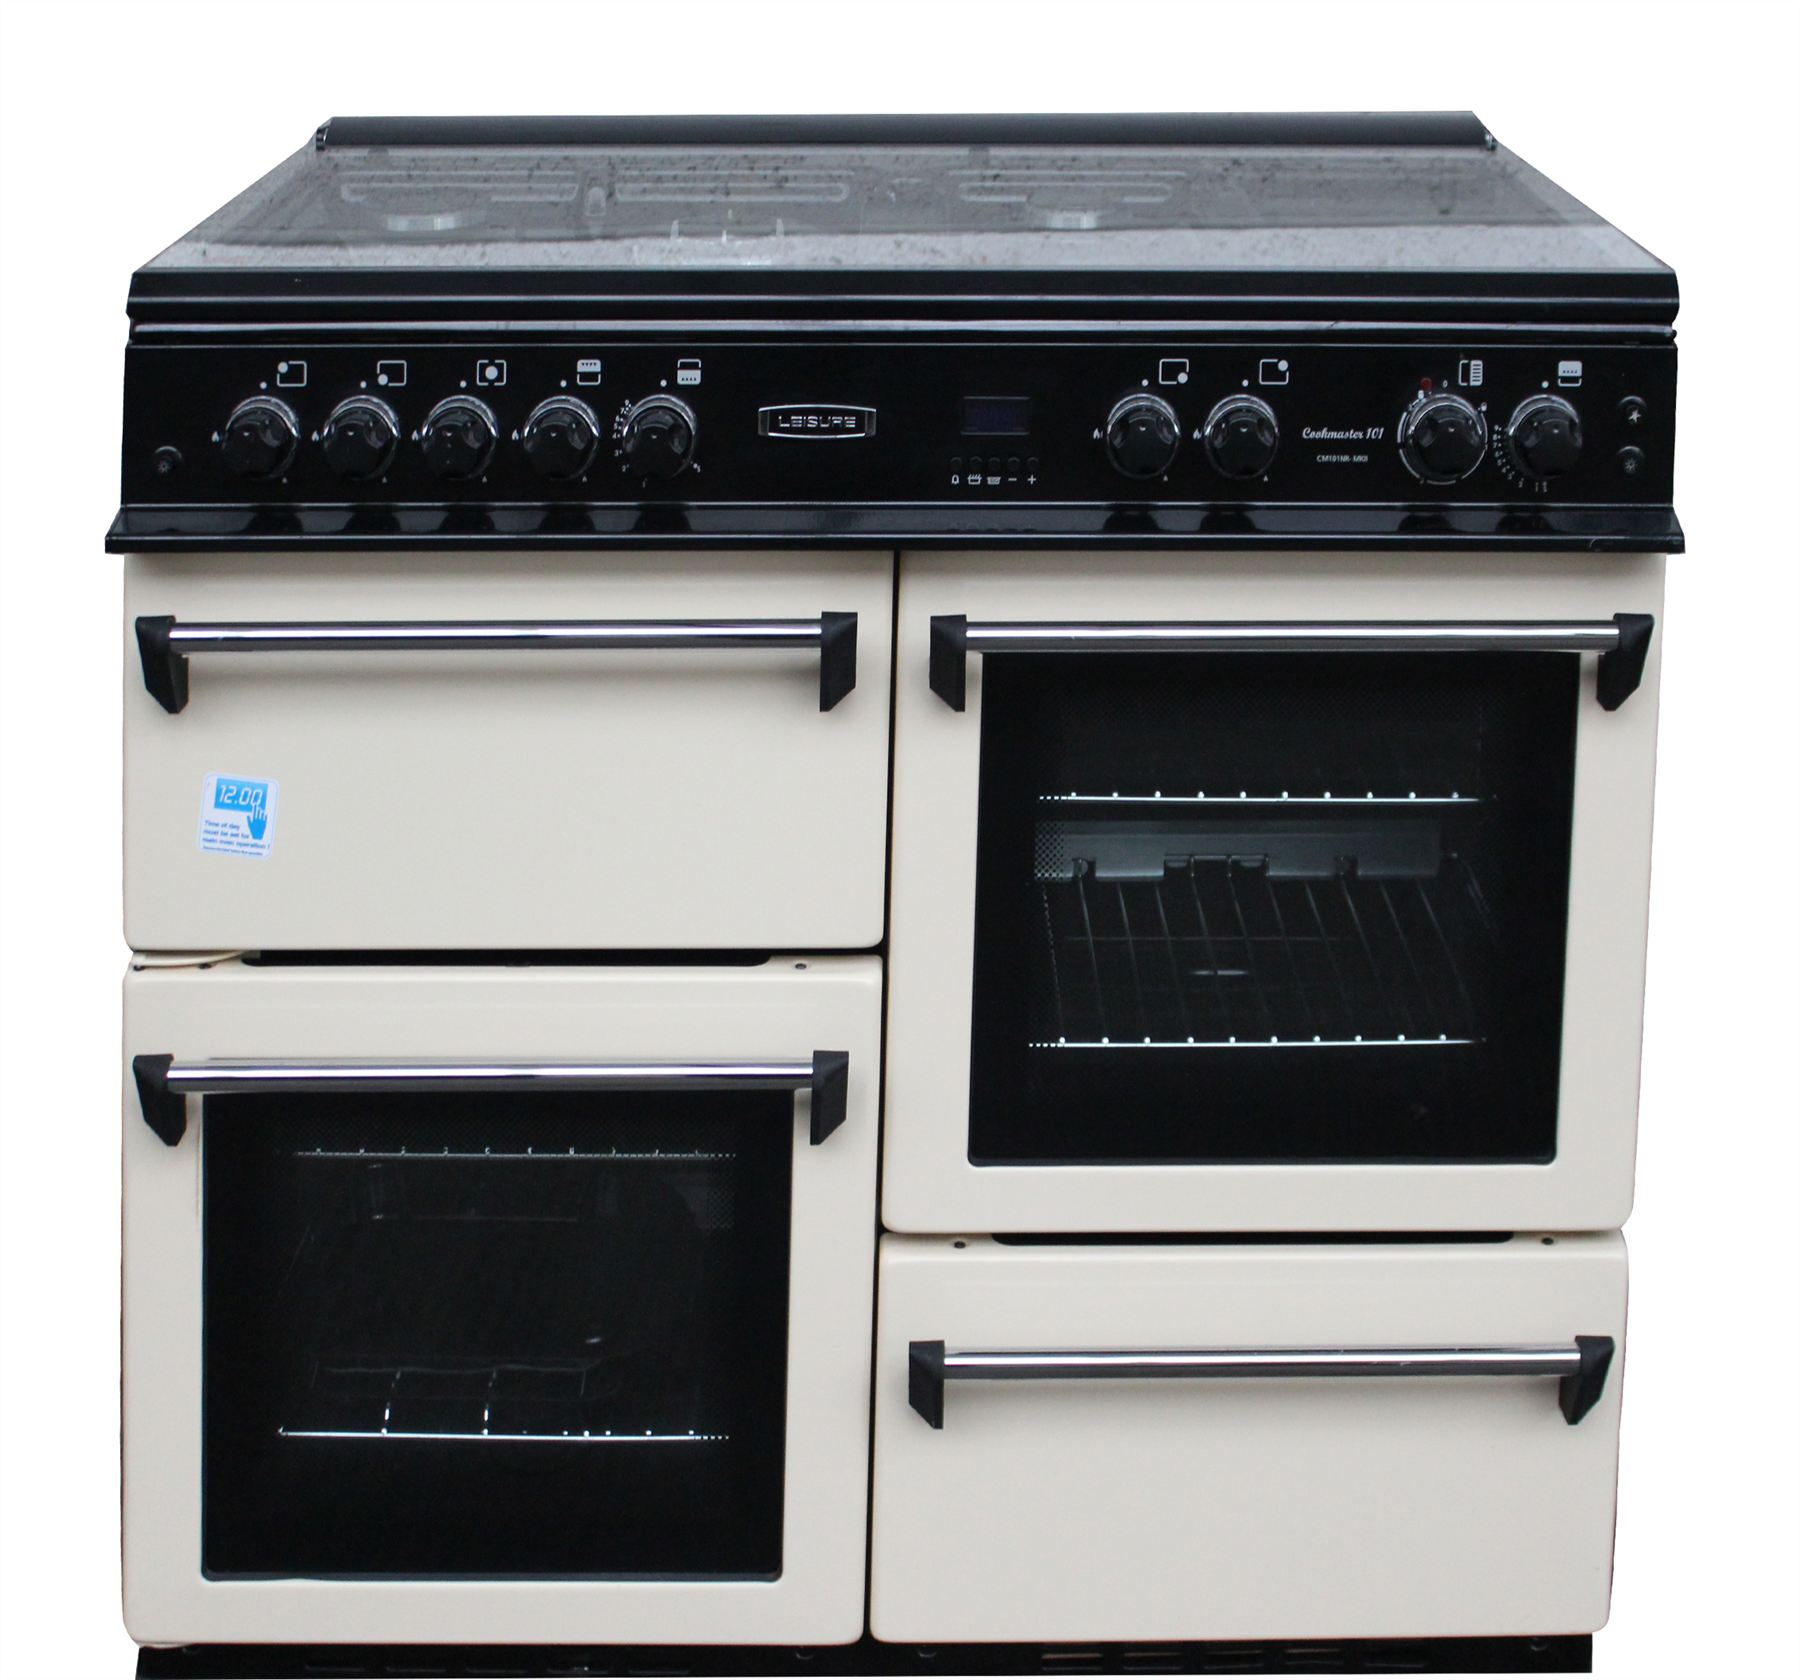 range oven leisure range oven Malibu Low Voltage Transformer Manual User Manual PDF